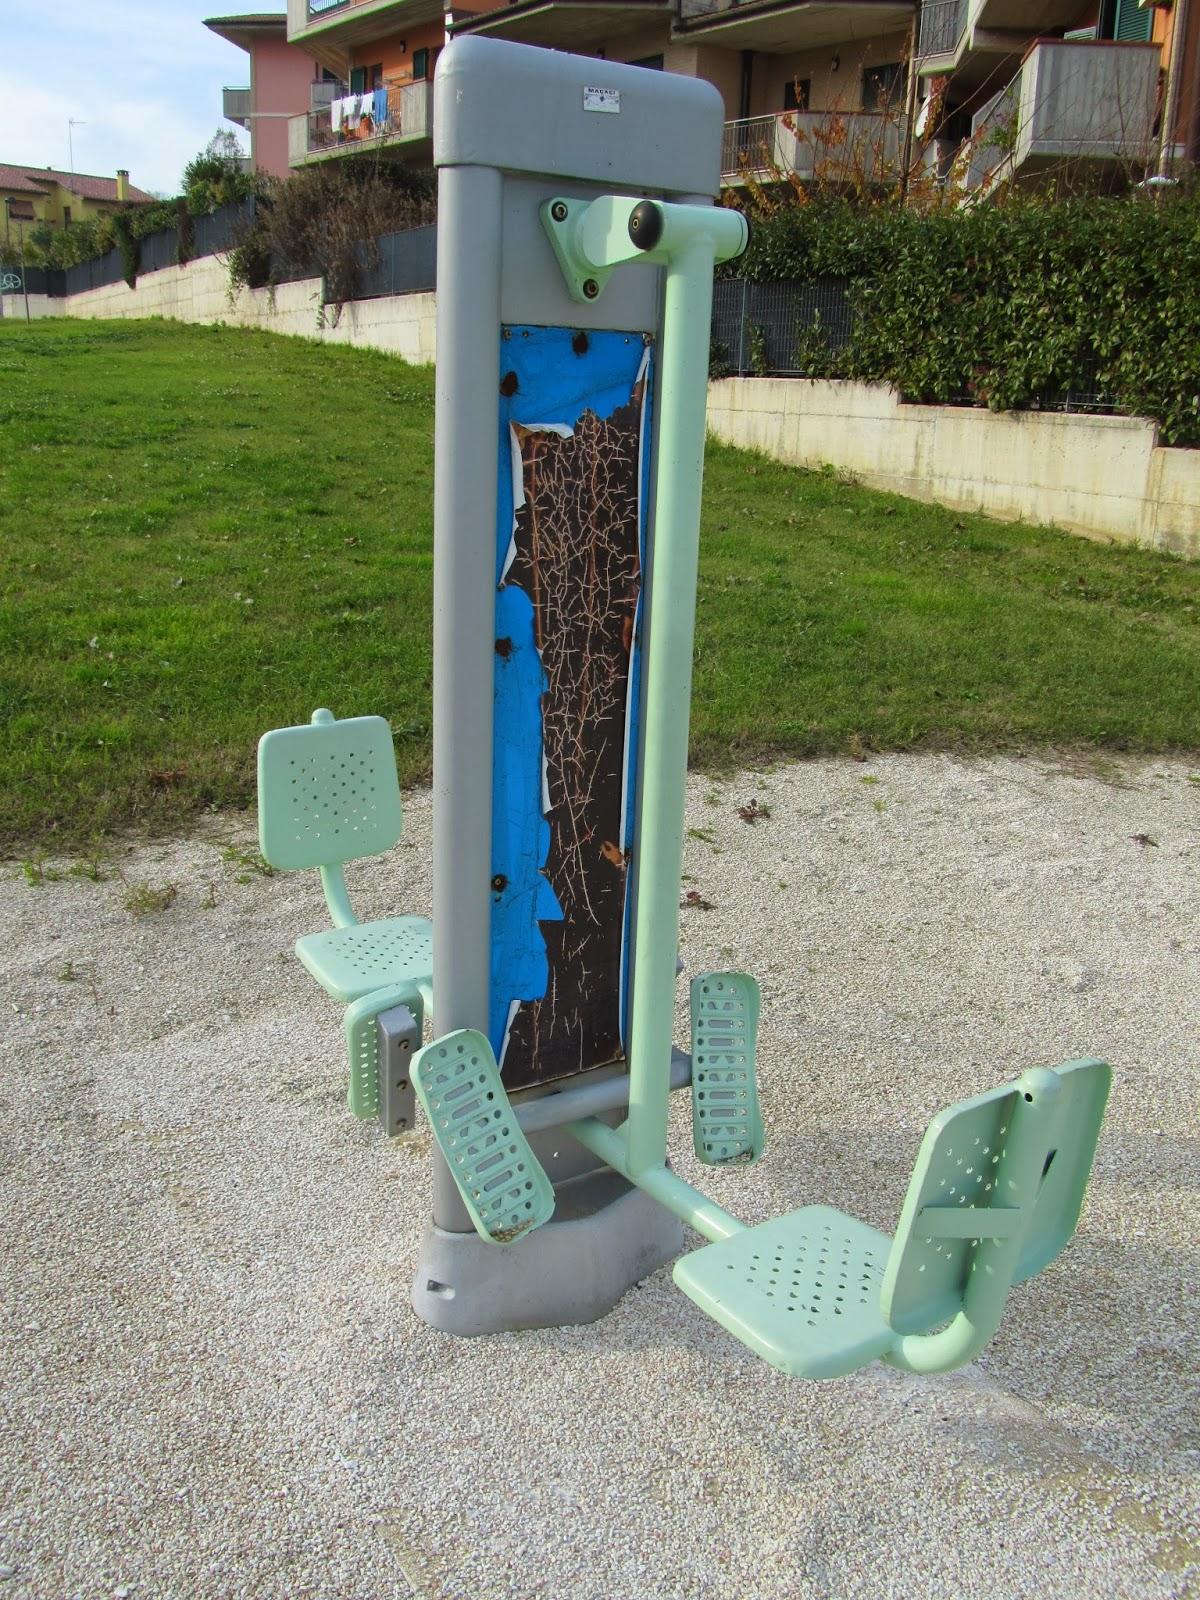 LORETODUEPUNTI: Parco fitness Loreto: ruggine e solitudine ...